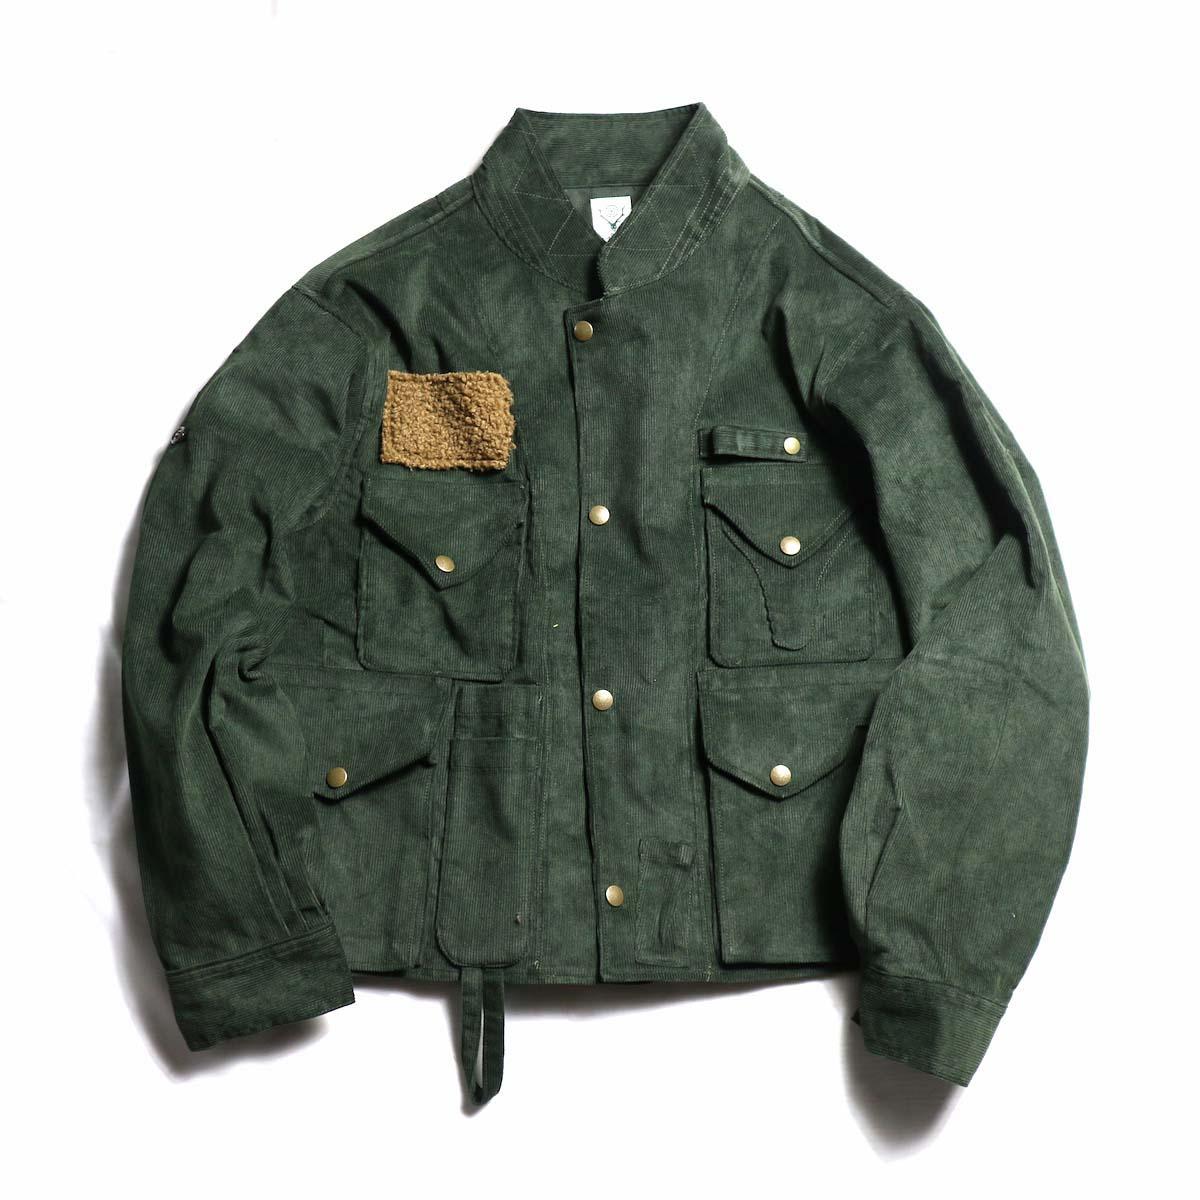 SOUTH2 WEST8 / E.H. Fishing Jacket 14W Corduroy(Green)